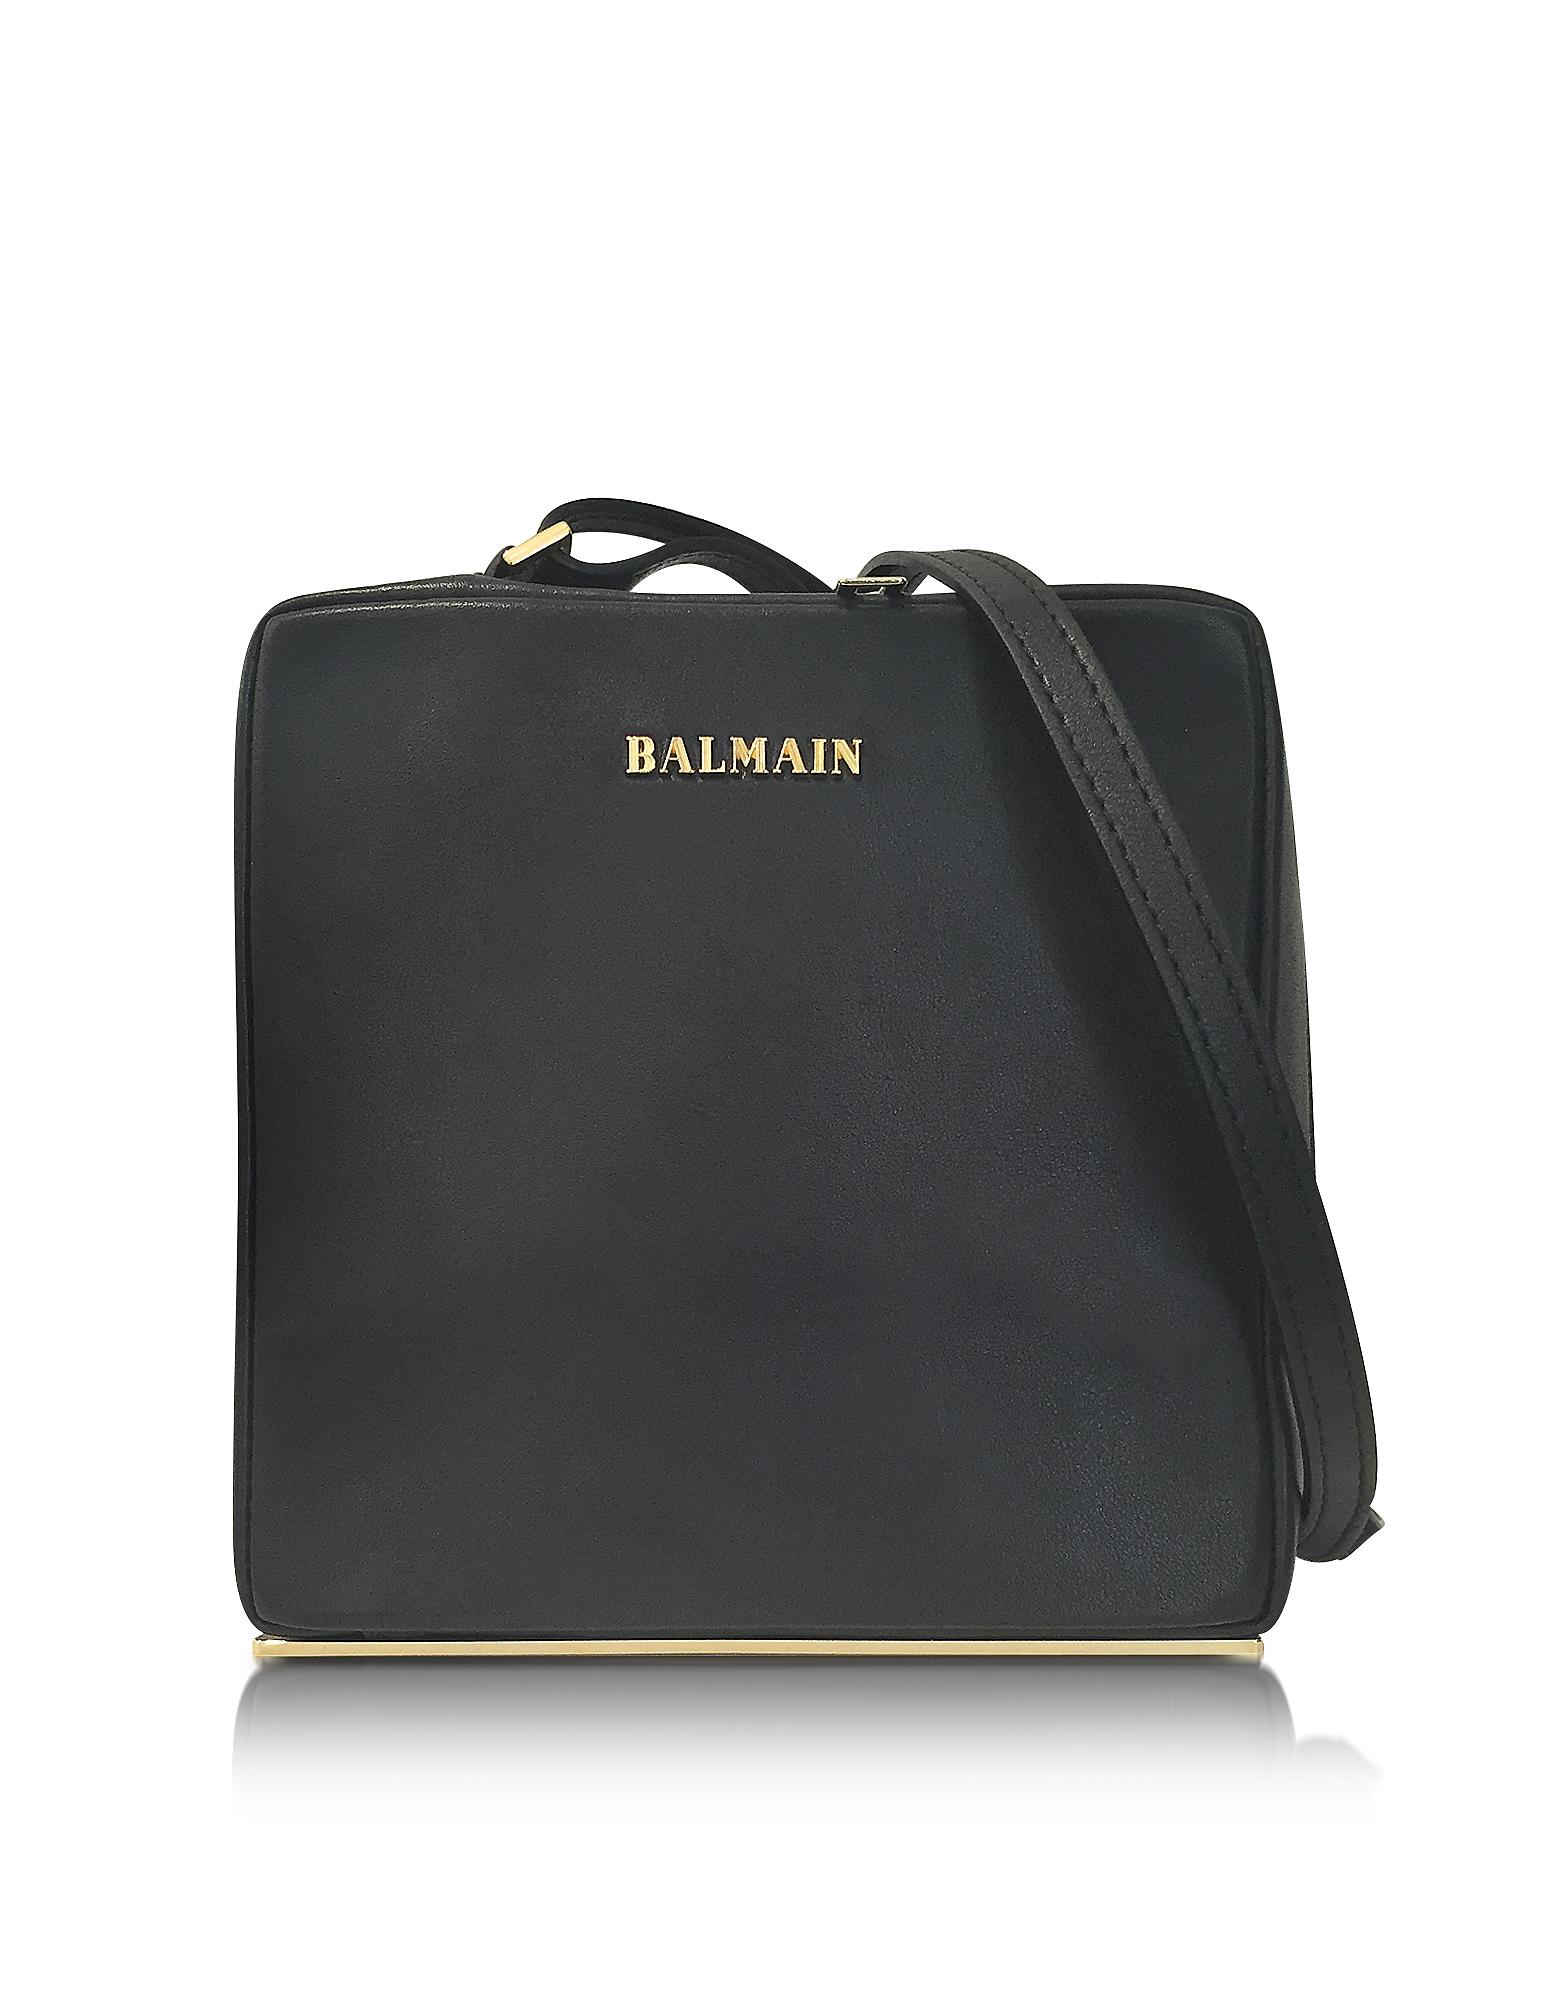 Balmain Pablito - Черная Кожаная Сумка на Плечо